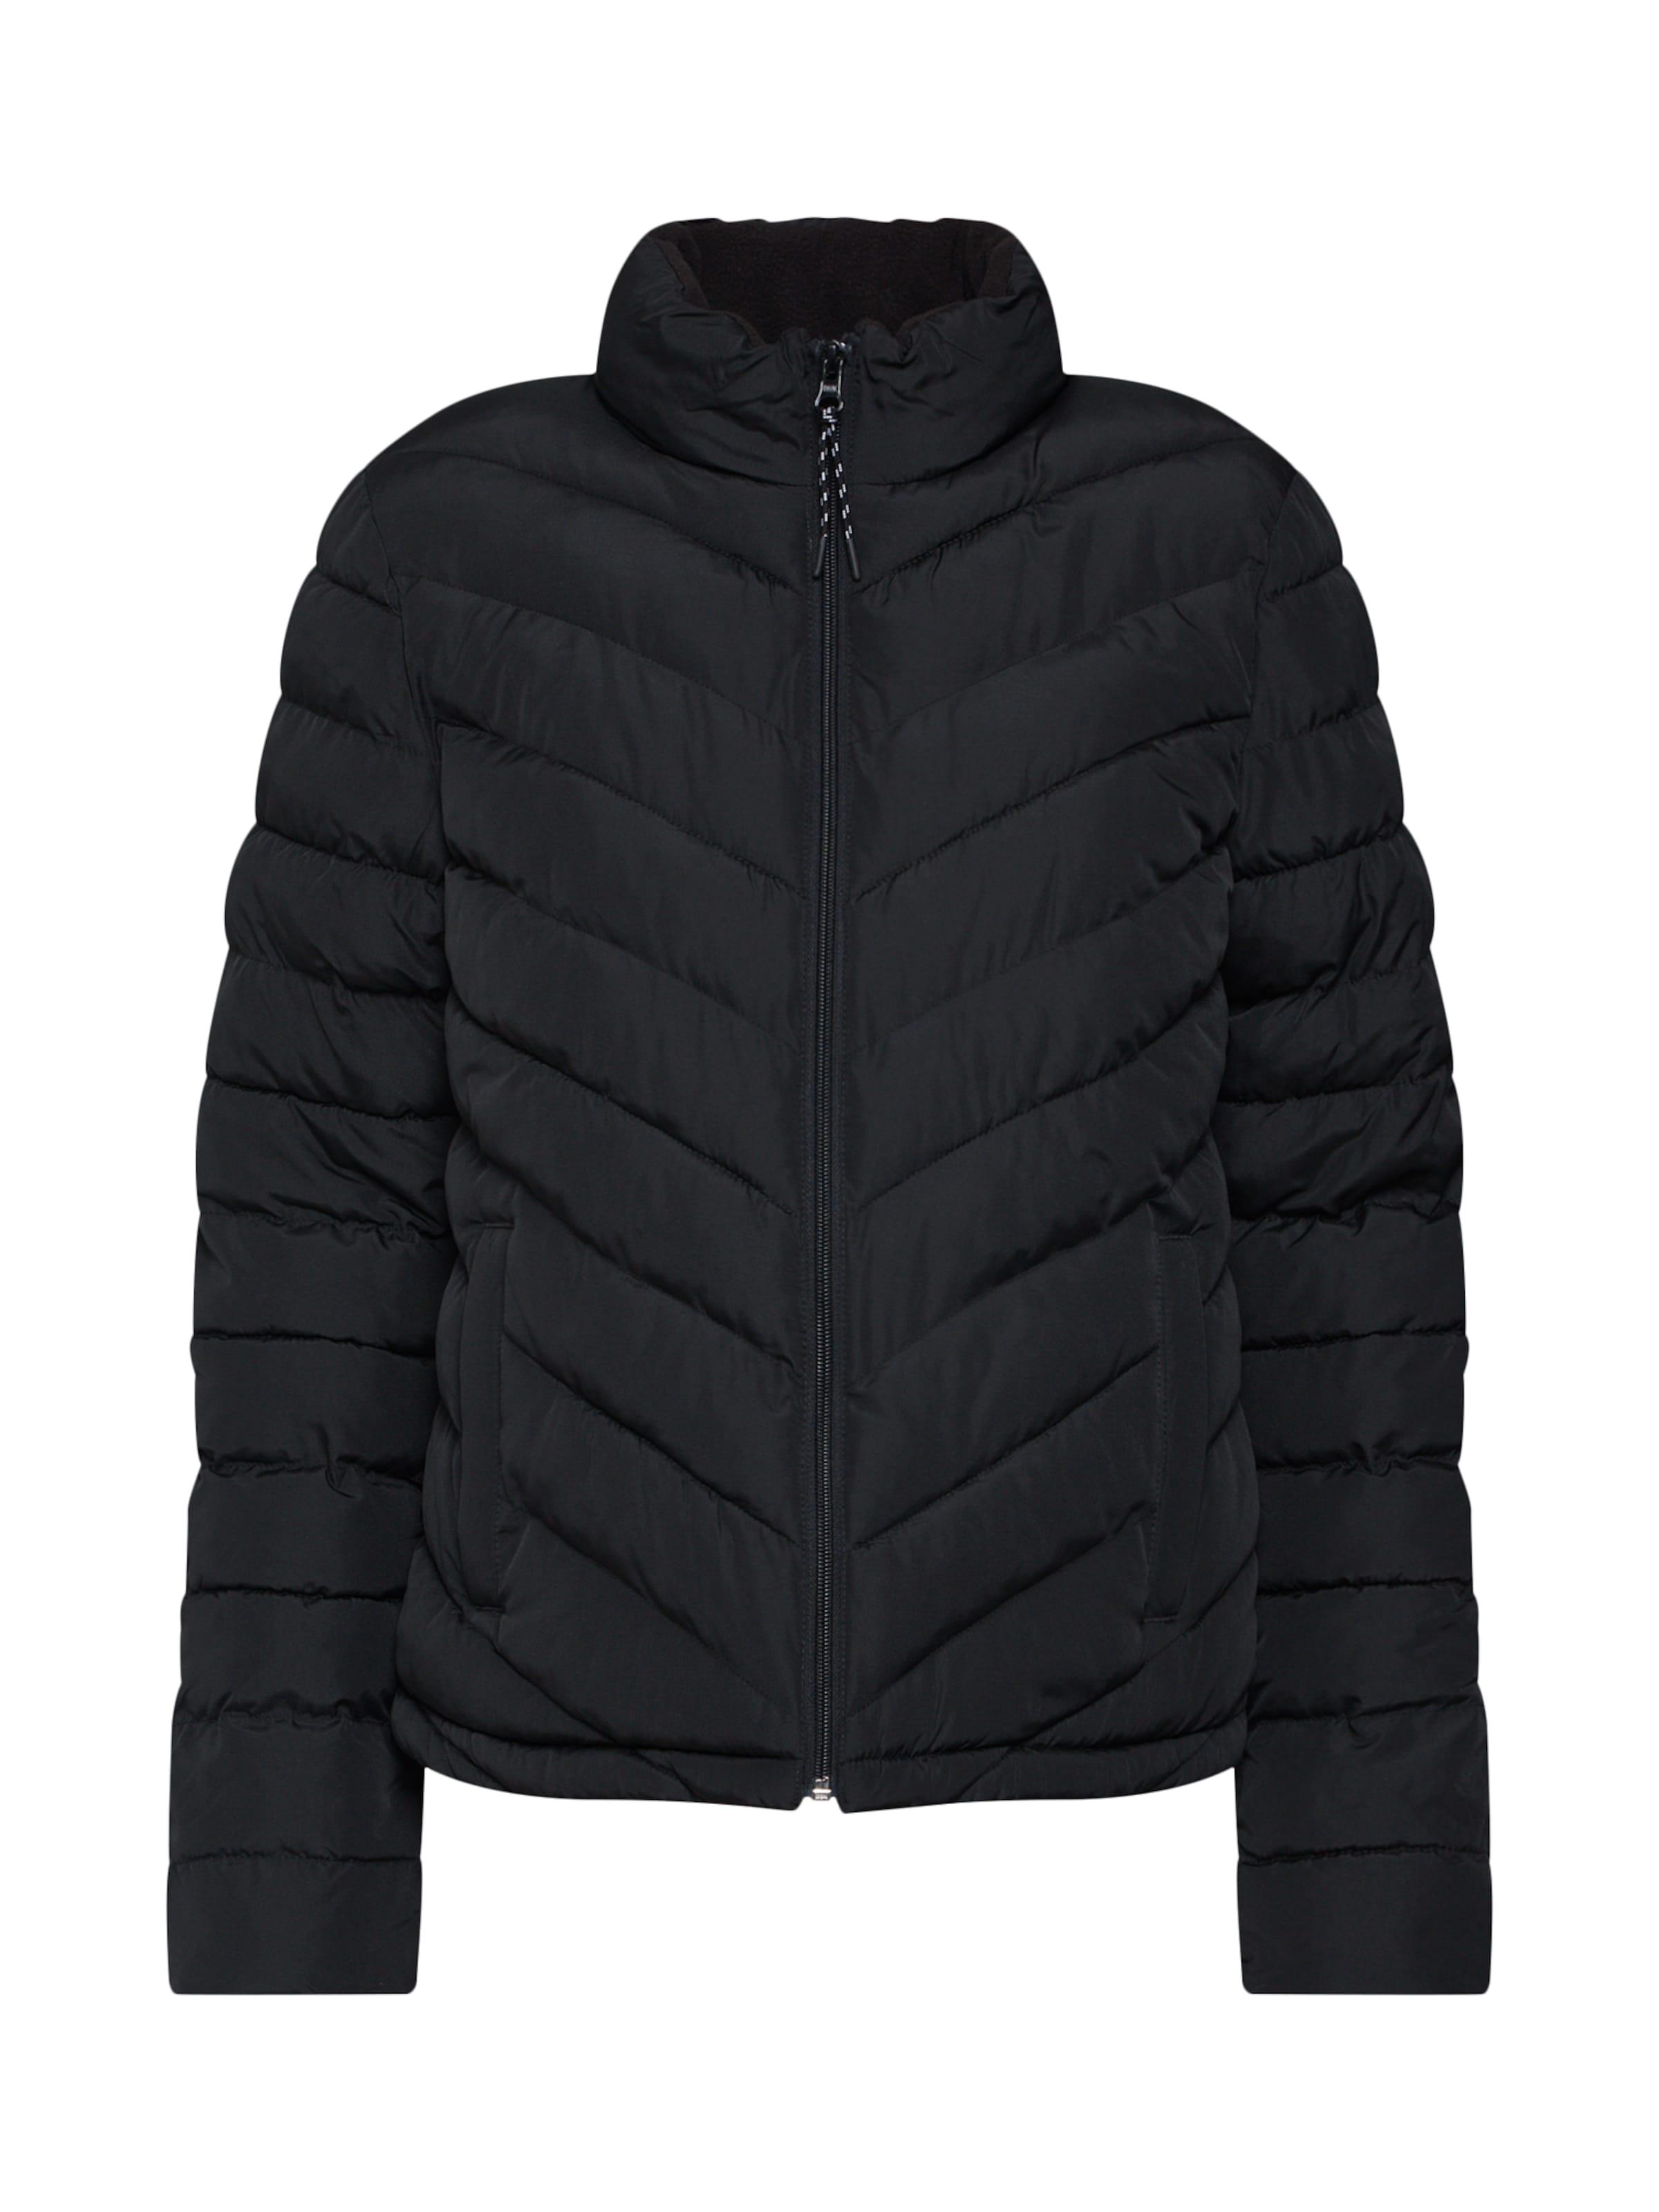 D'hiver Oc In Foncé Vert GapVeste Jacket' 'v Lw sh hdorsCBtQx